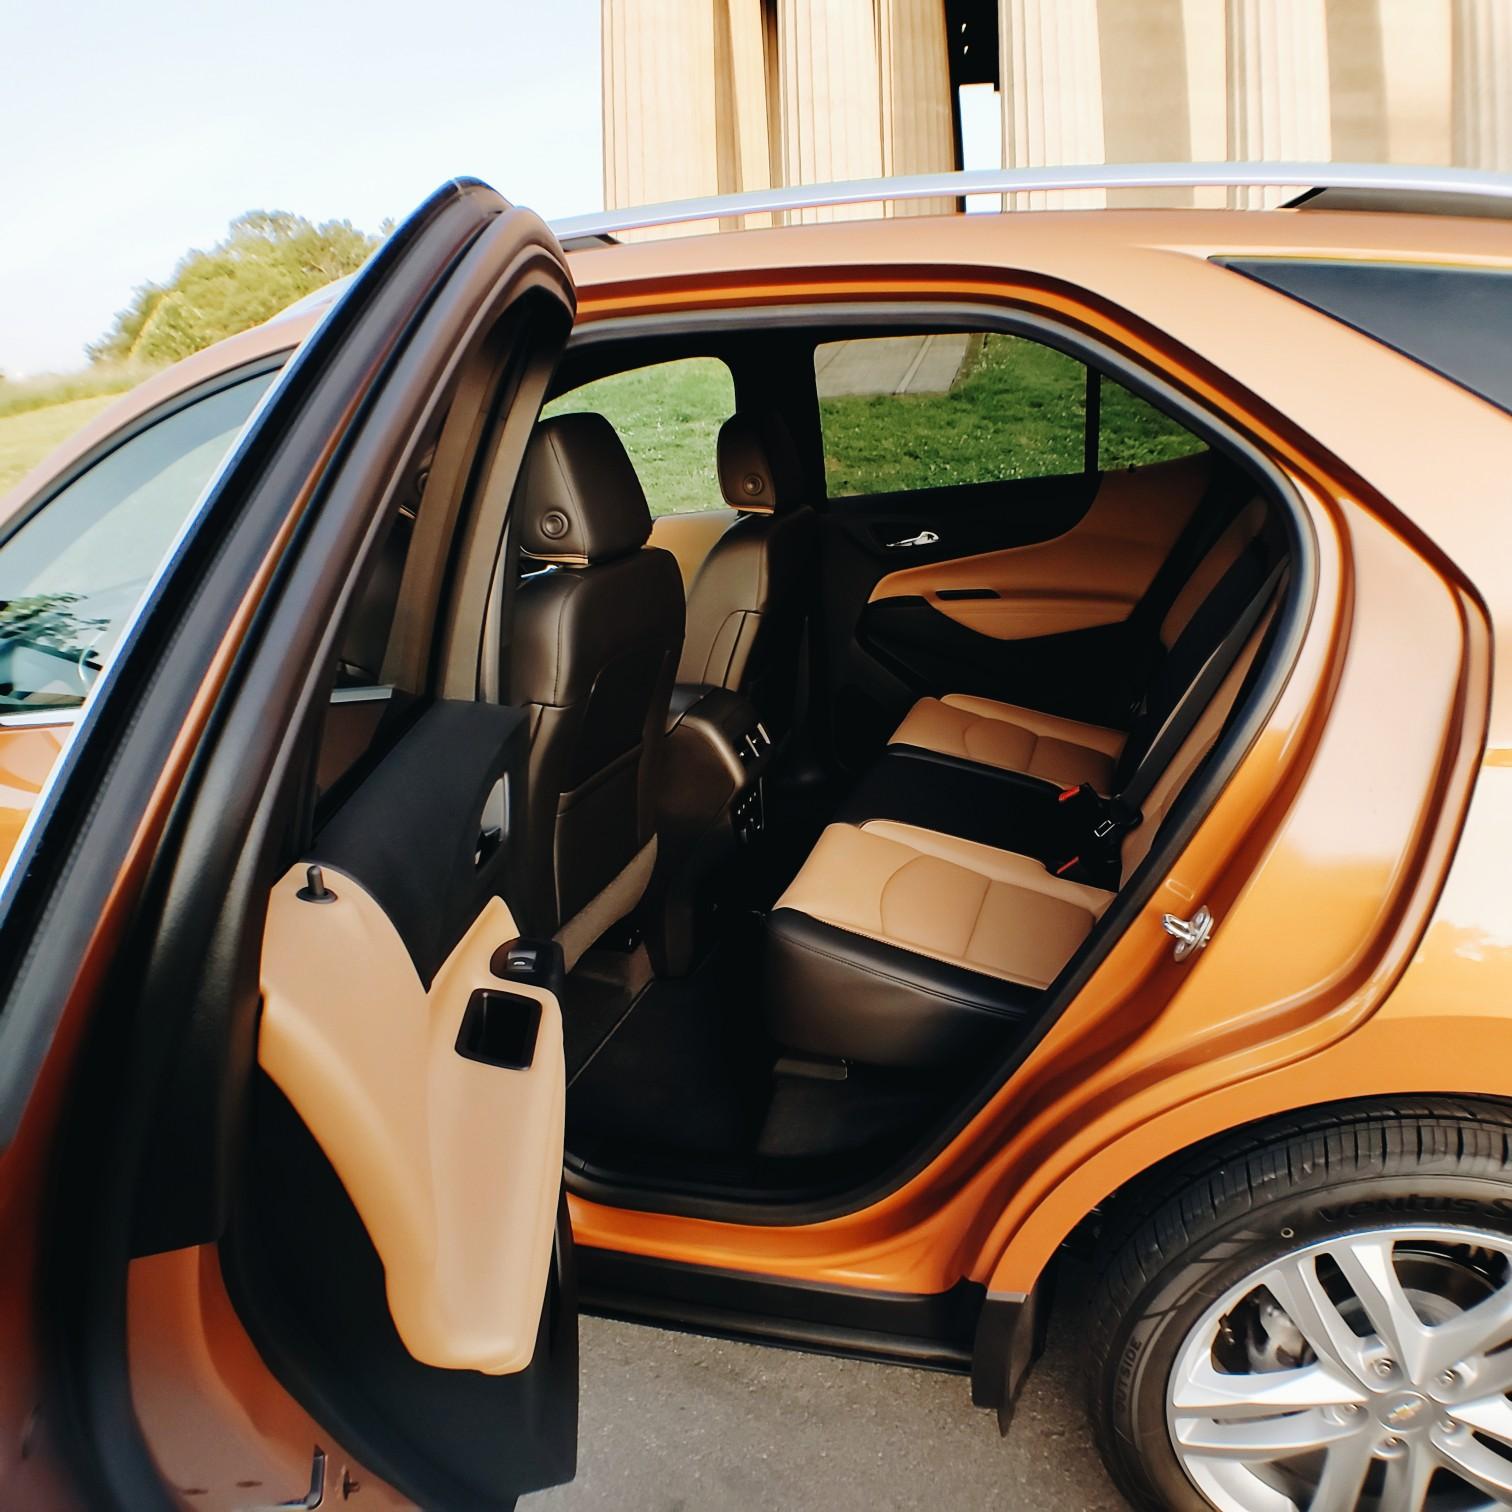 Car Review Premiere 2018 Chevrolet Equinox Interior Seats